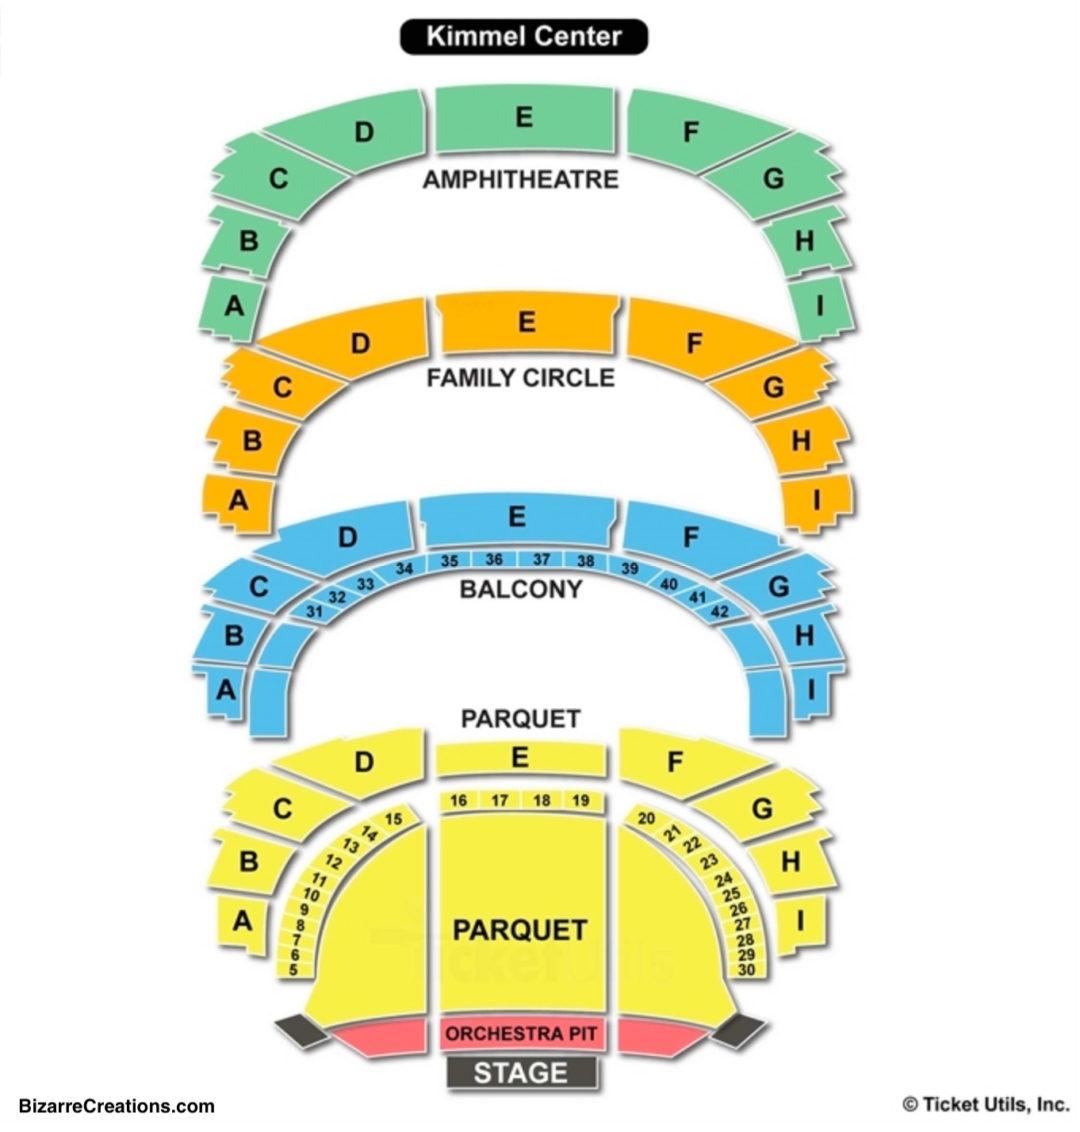 Verizon Hall At The Kimmel Center Seating Chart | Seating Charts & Tickets